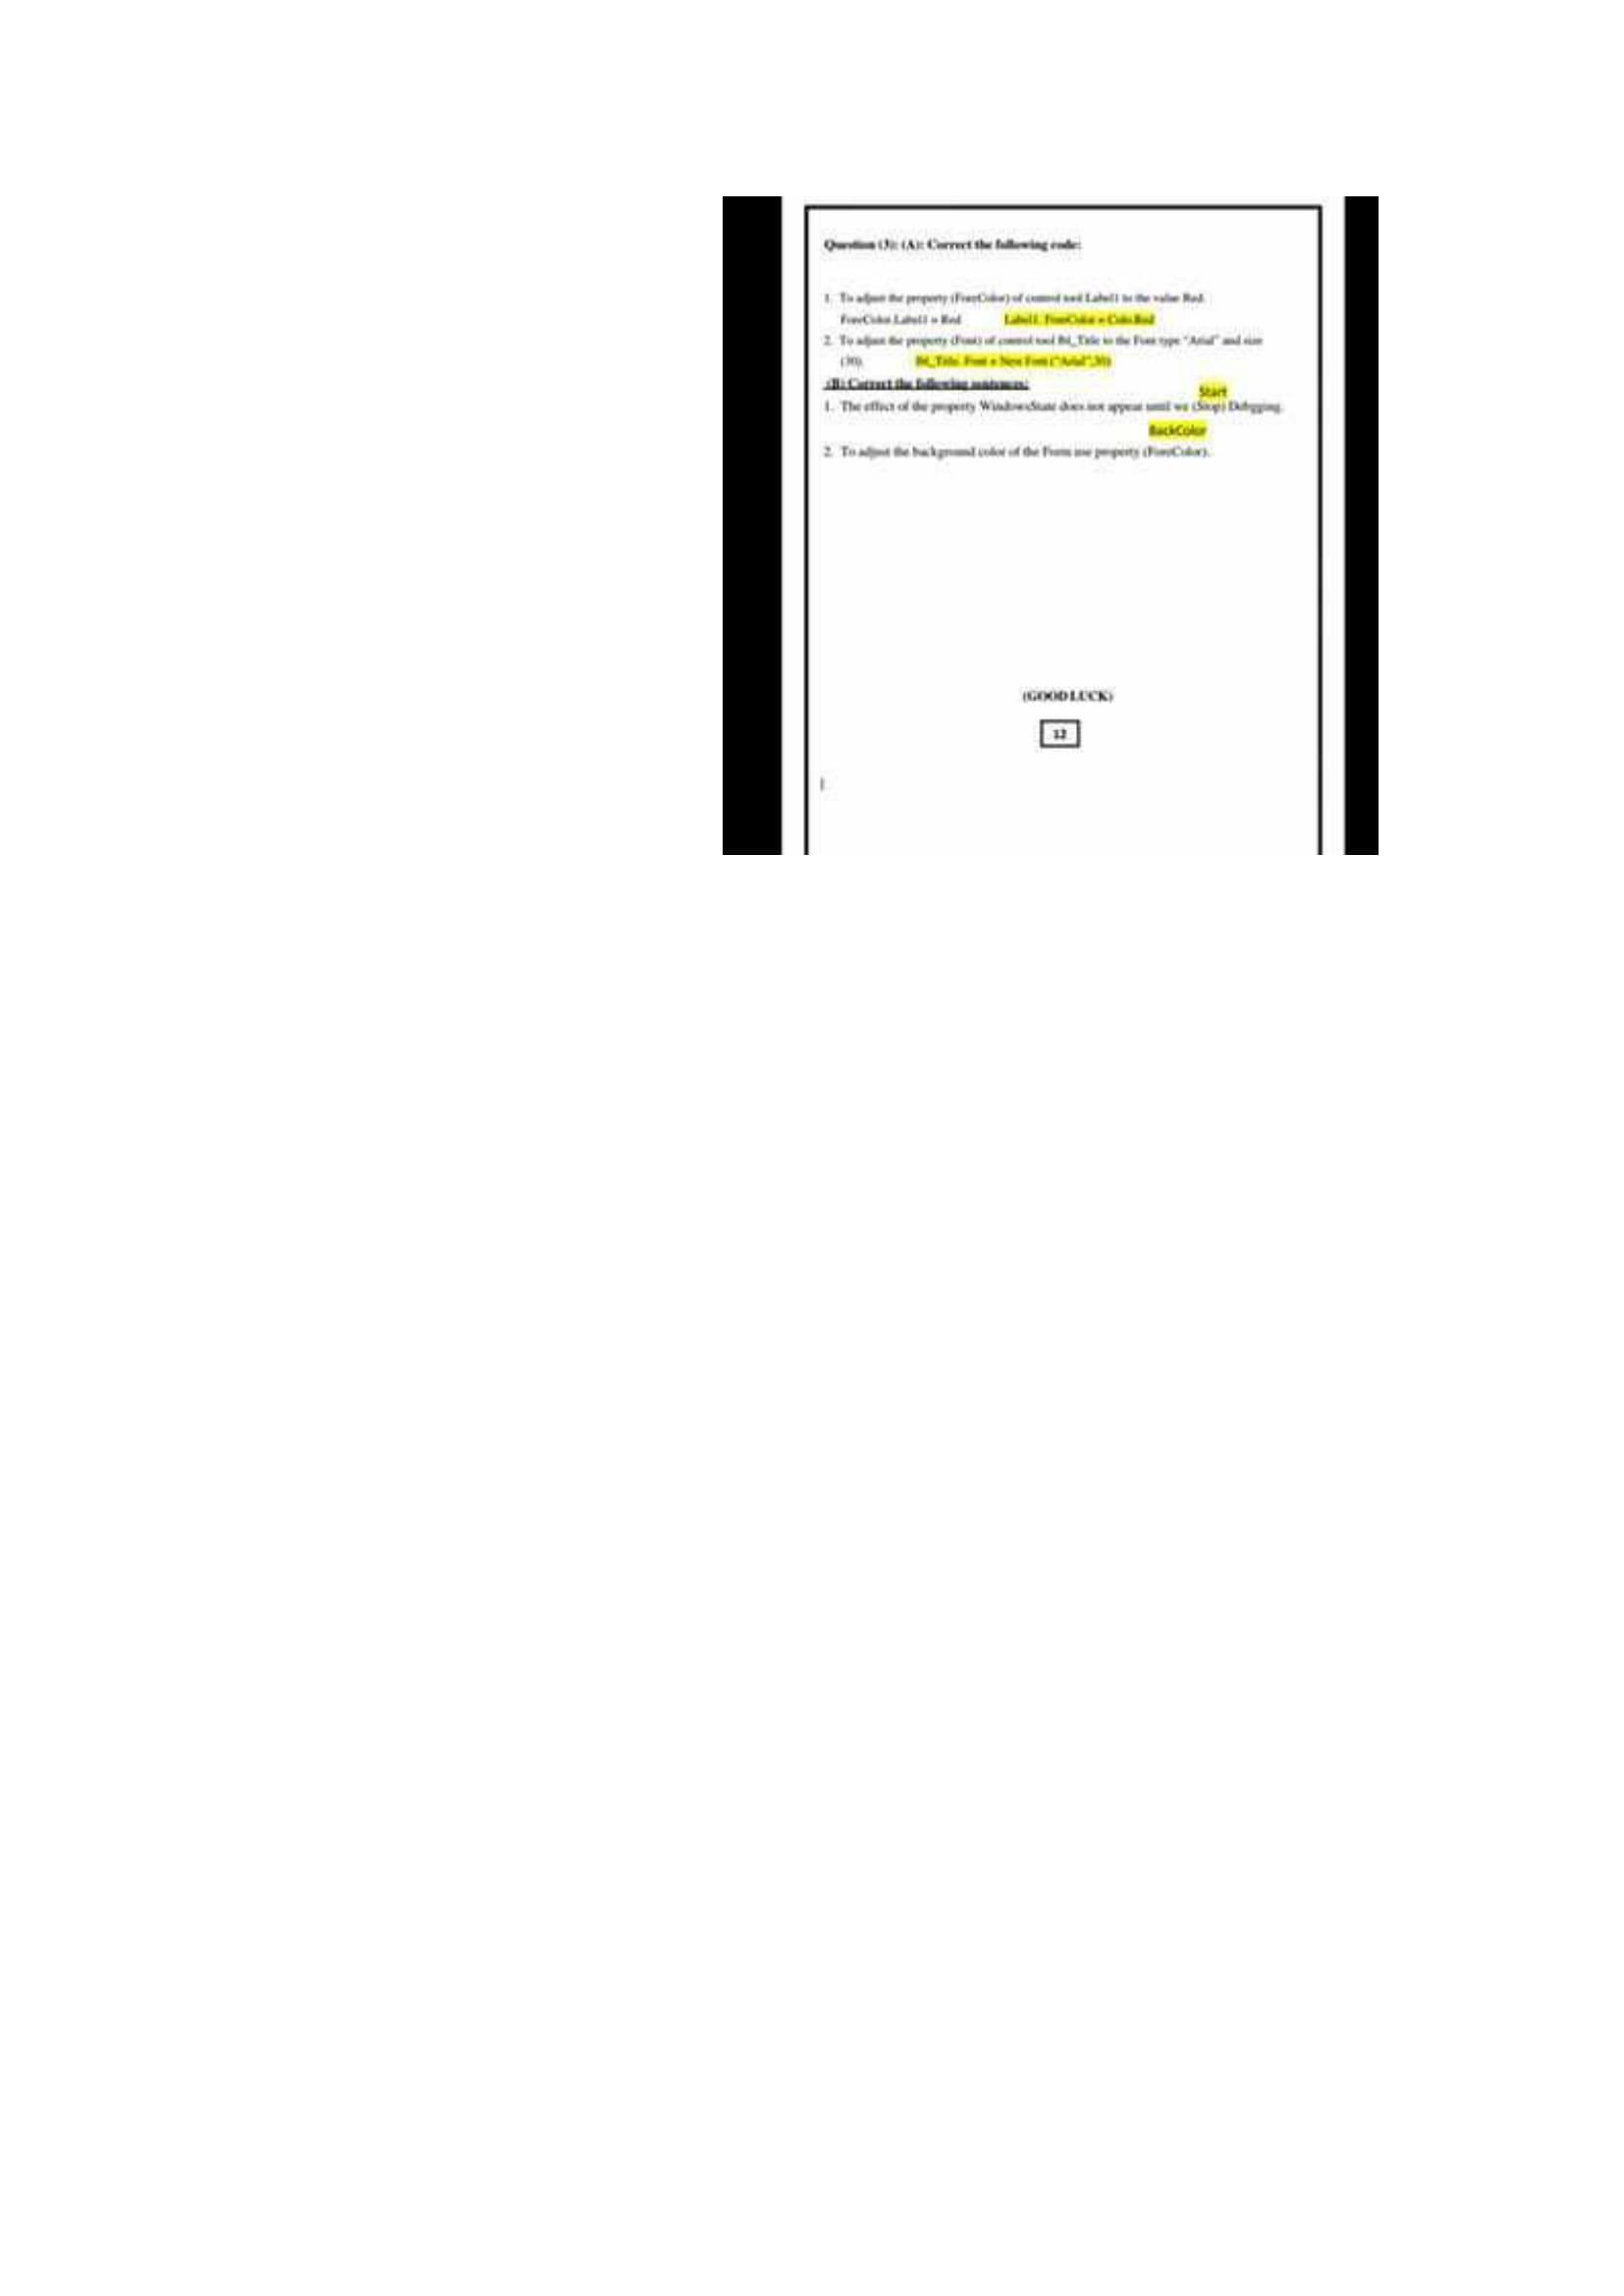 exam-eg.com_1510929038121.jpg